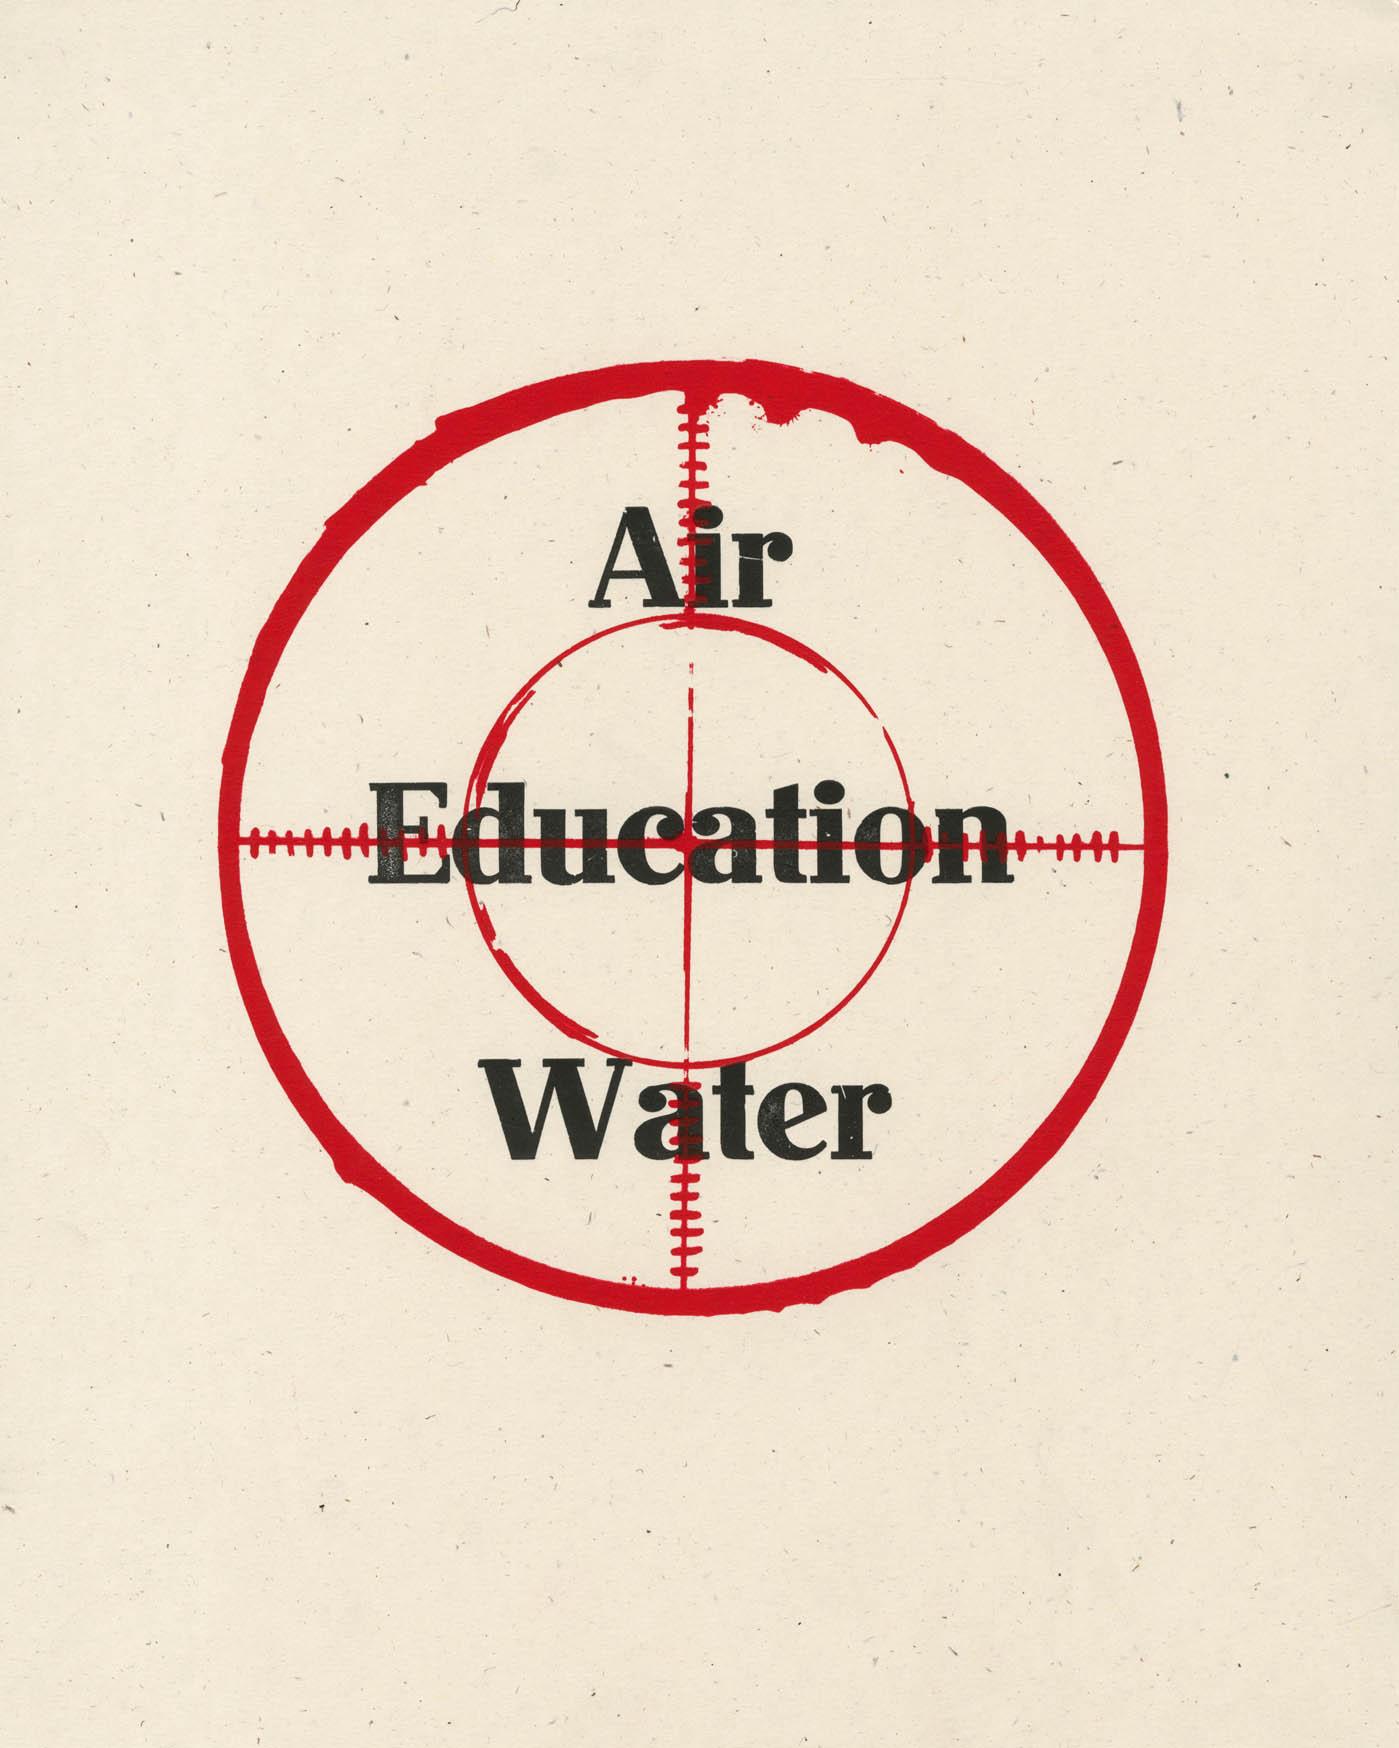 Air Education Water